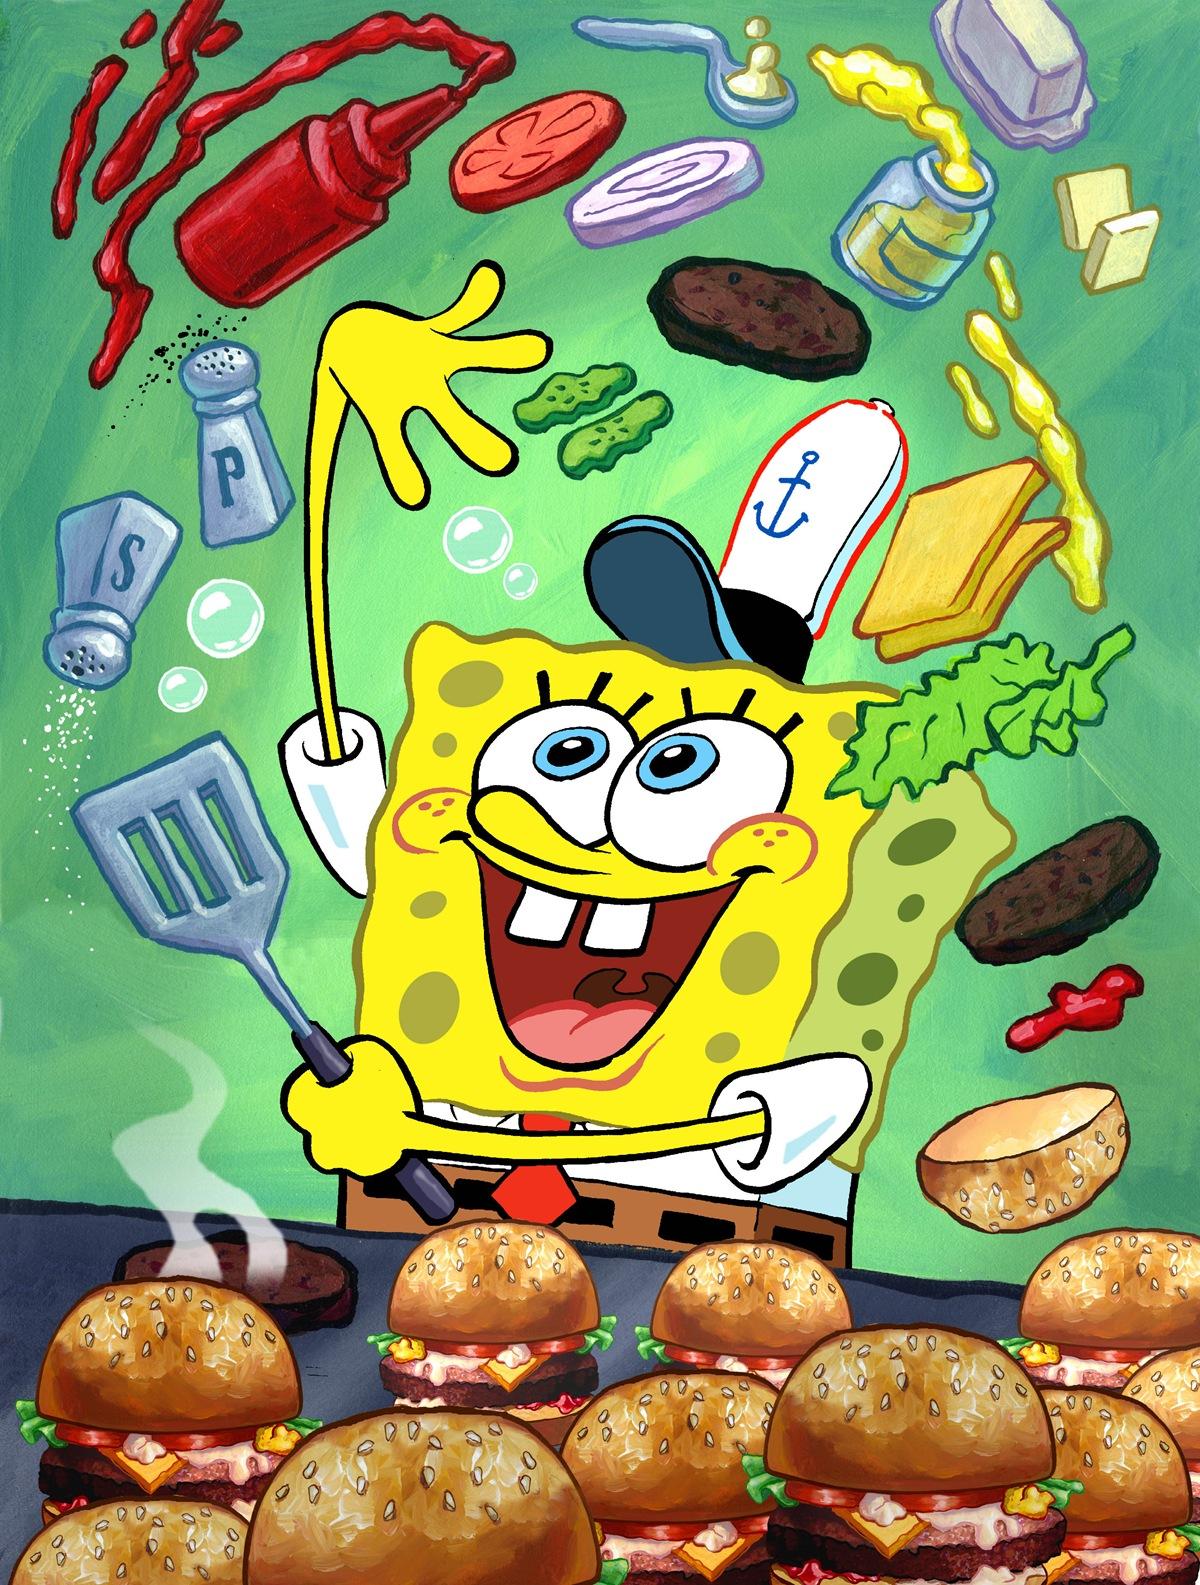 Burger clipart krabby patty Recipe Spongebob Patty squarepants Jelly